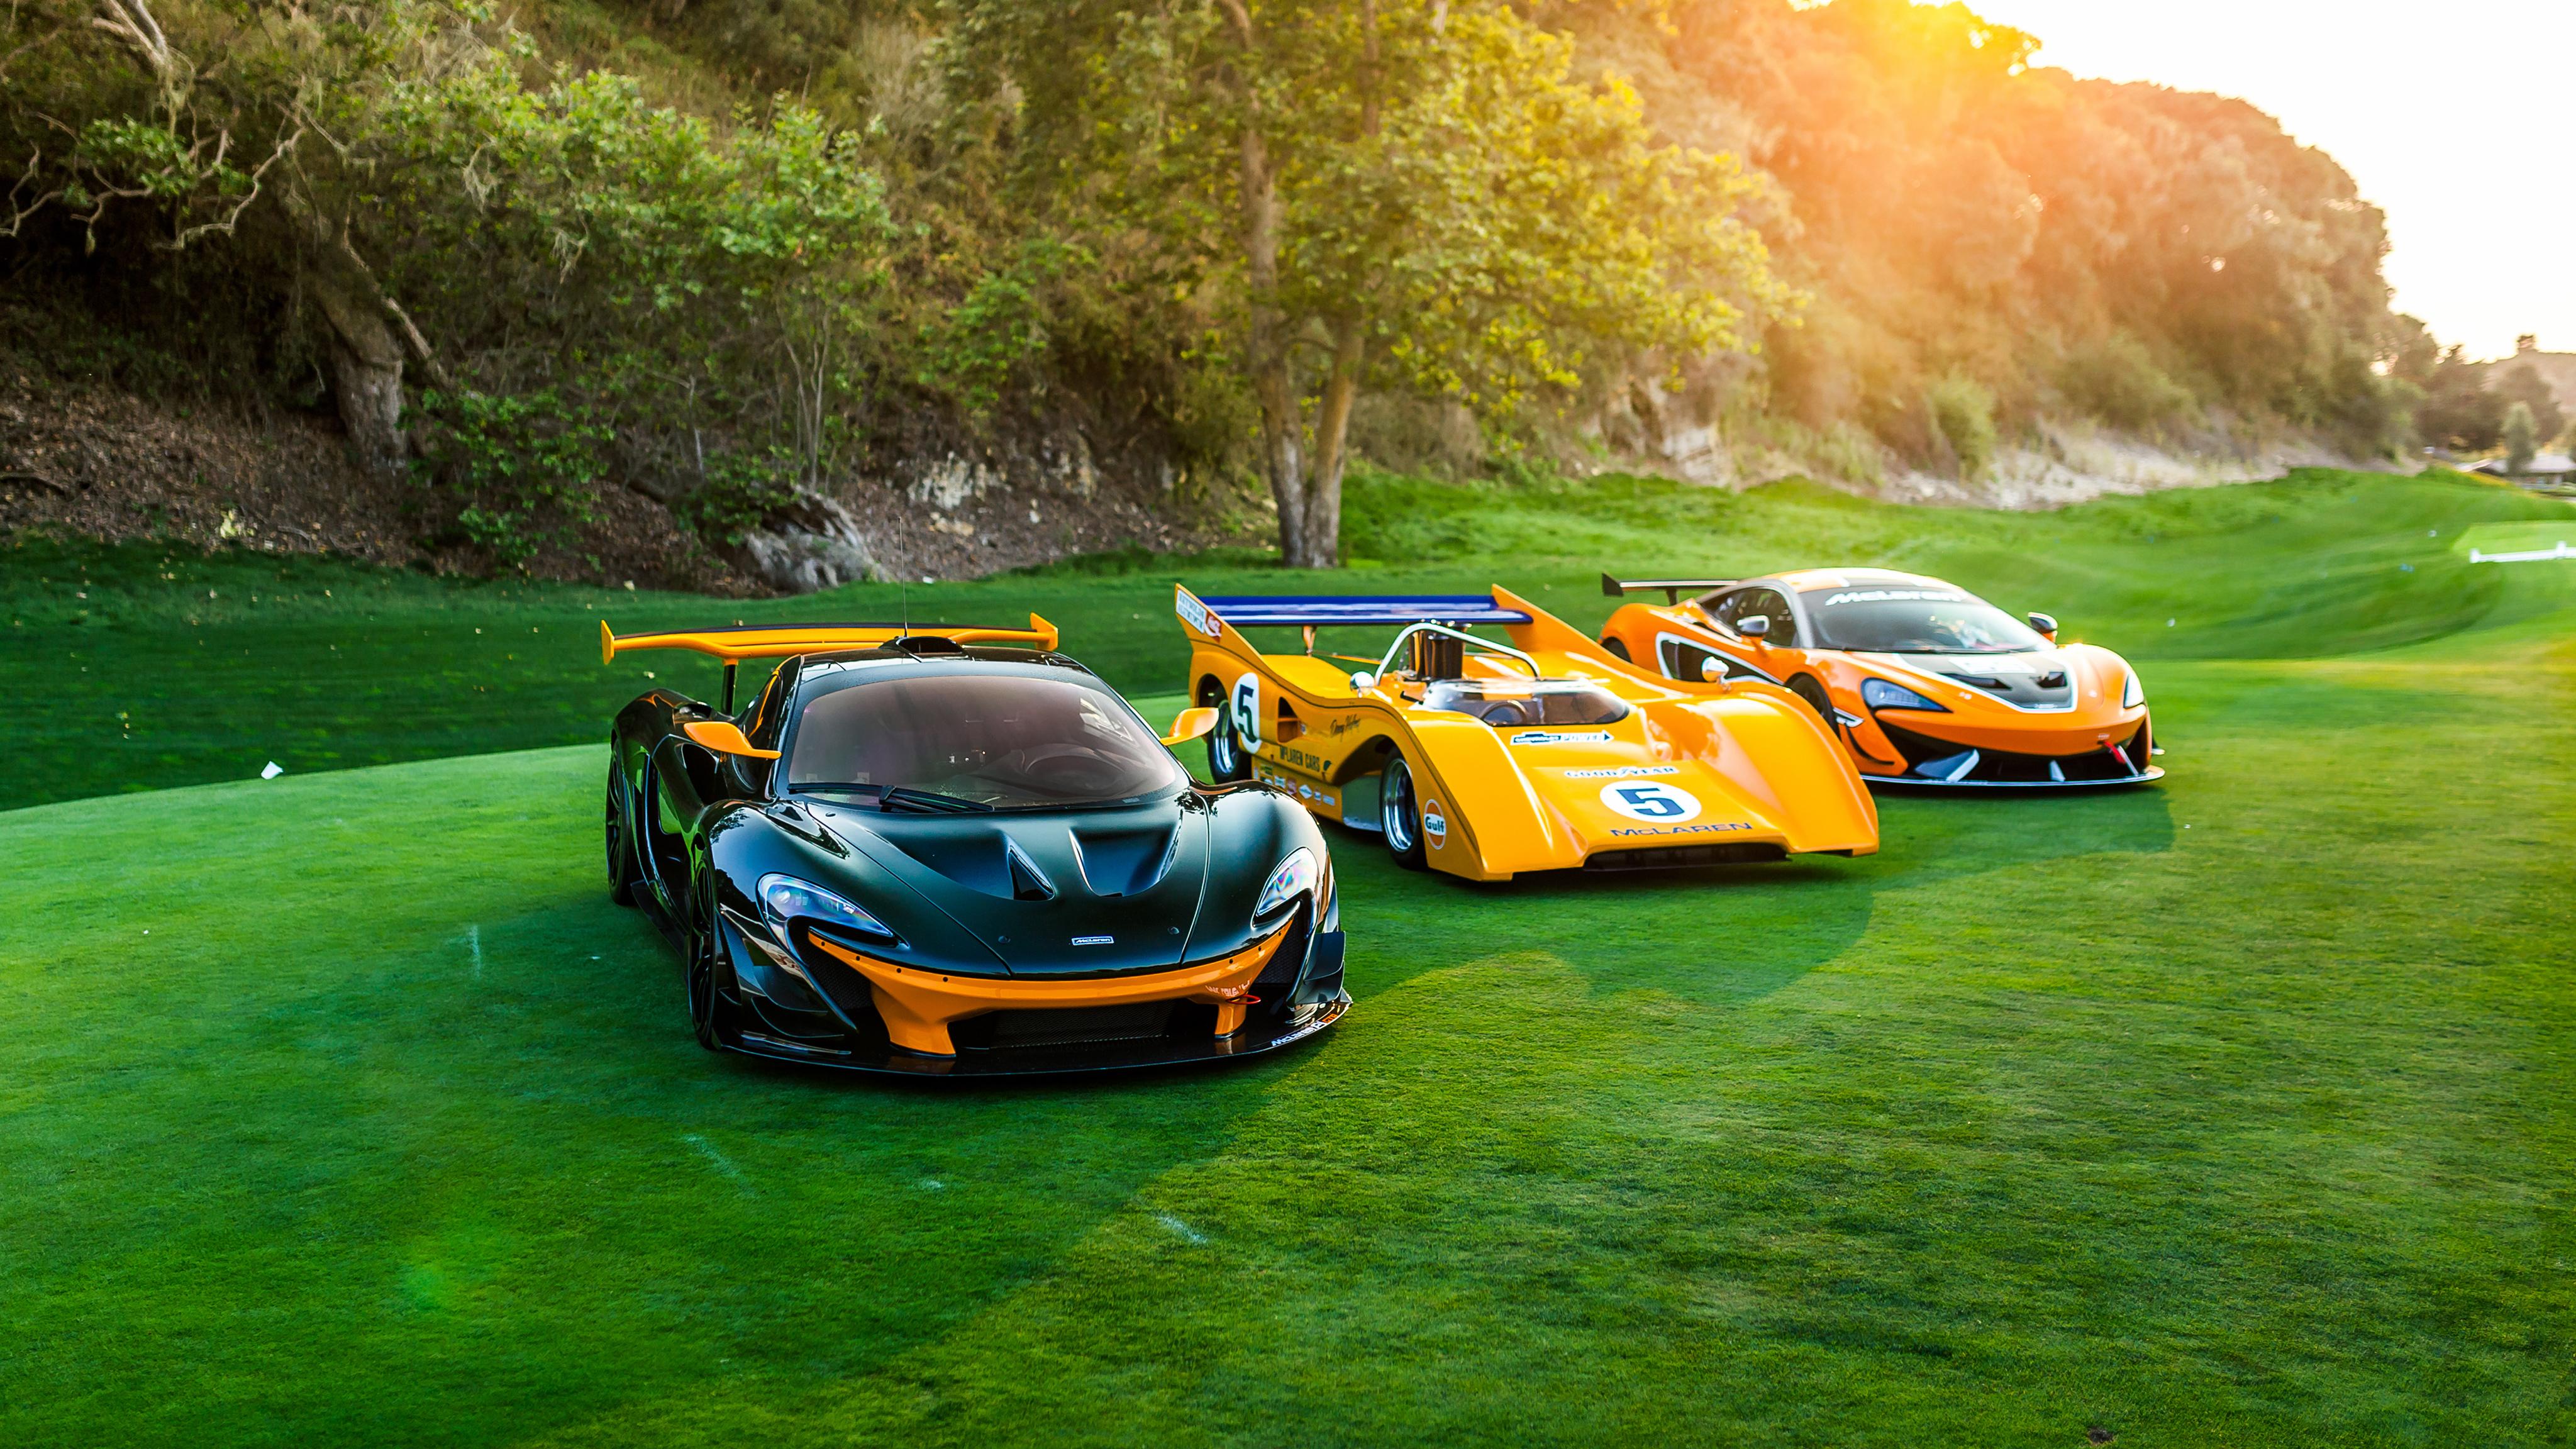 McLaren P1 GTR Sports cars 4K Wallpaper HD Car Wallpapers ID 9142 4096x2304